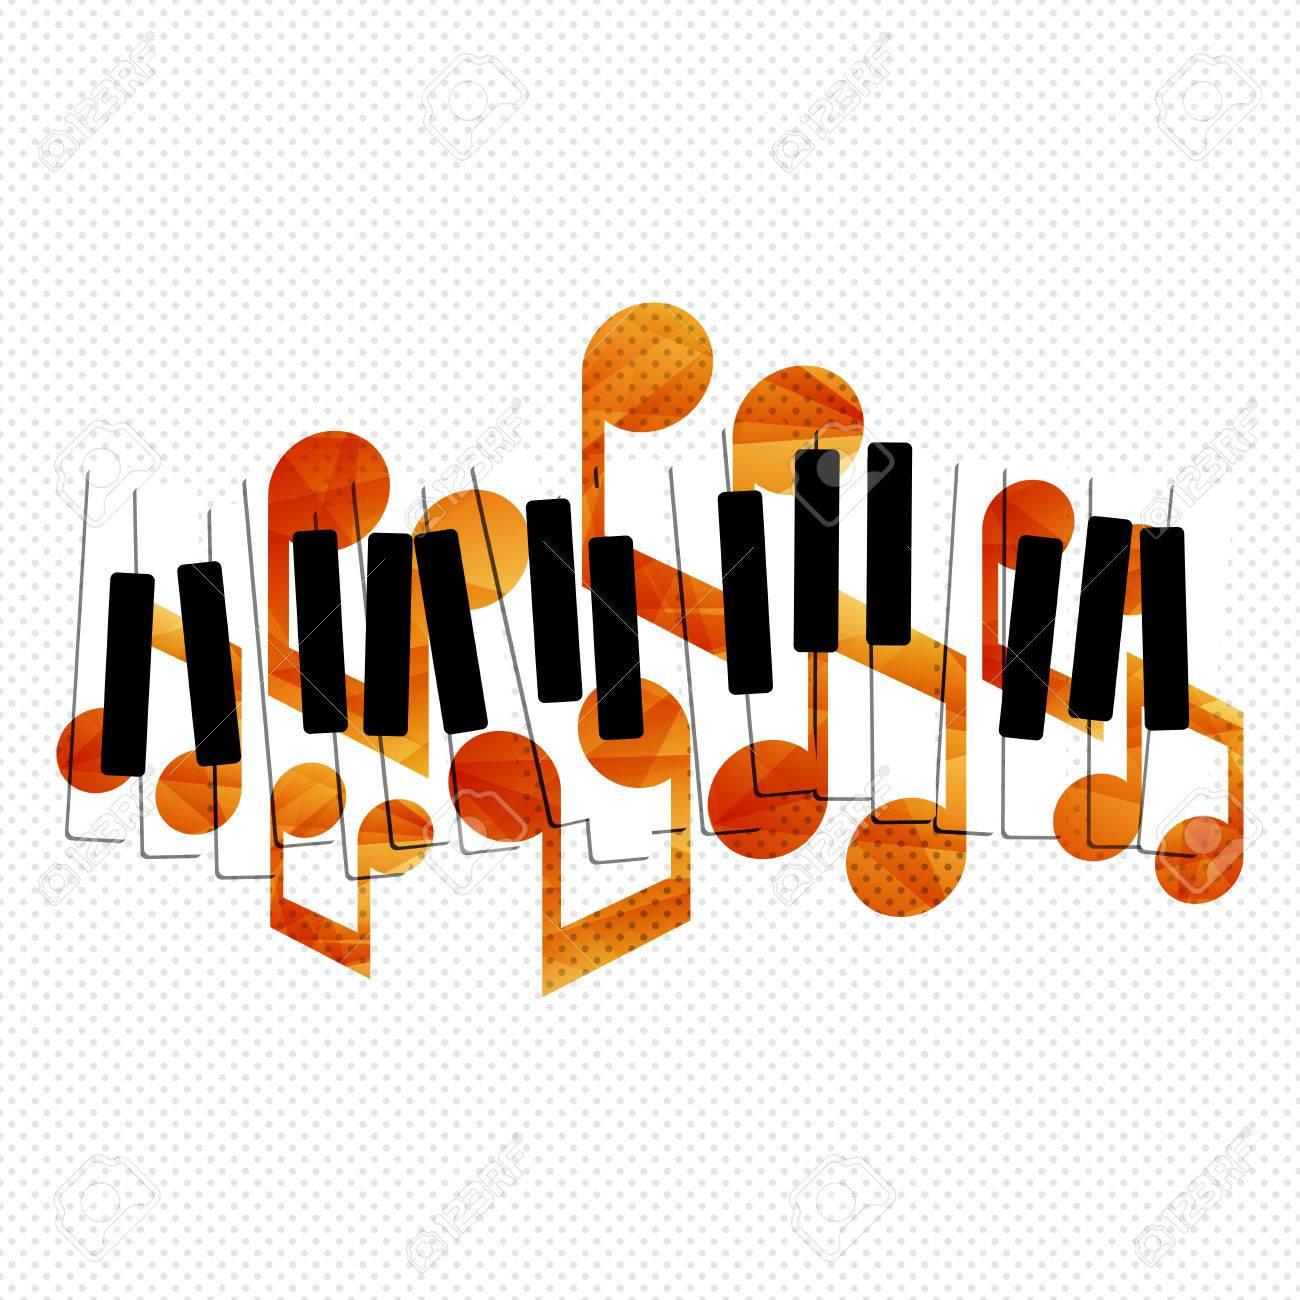 Piano music creative concept illustration. Vector graphic template. - 46791299